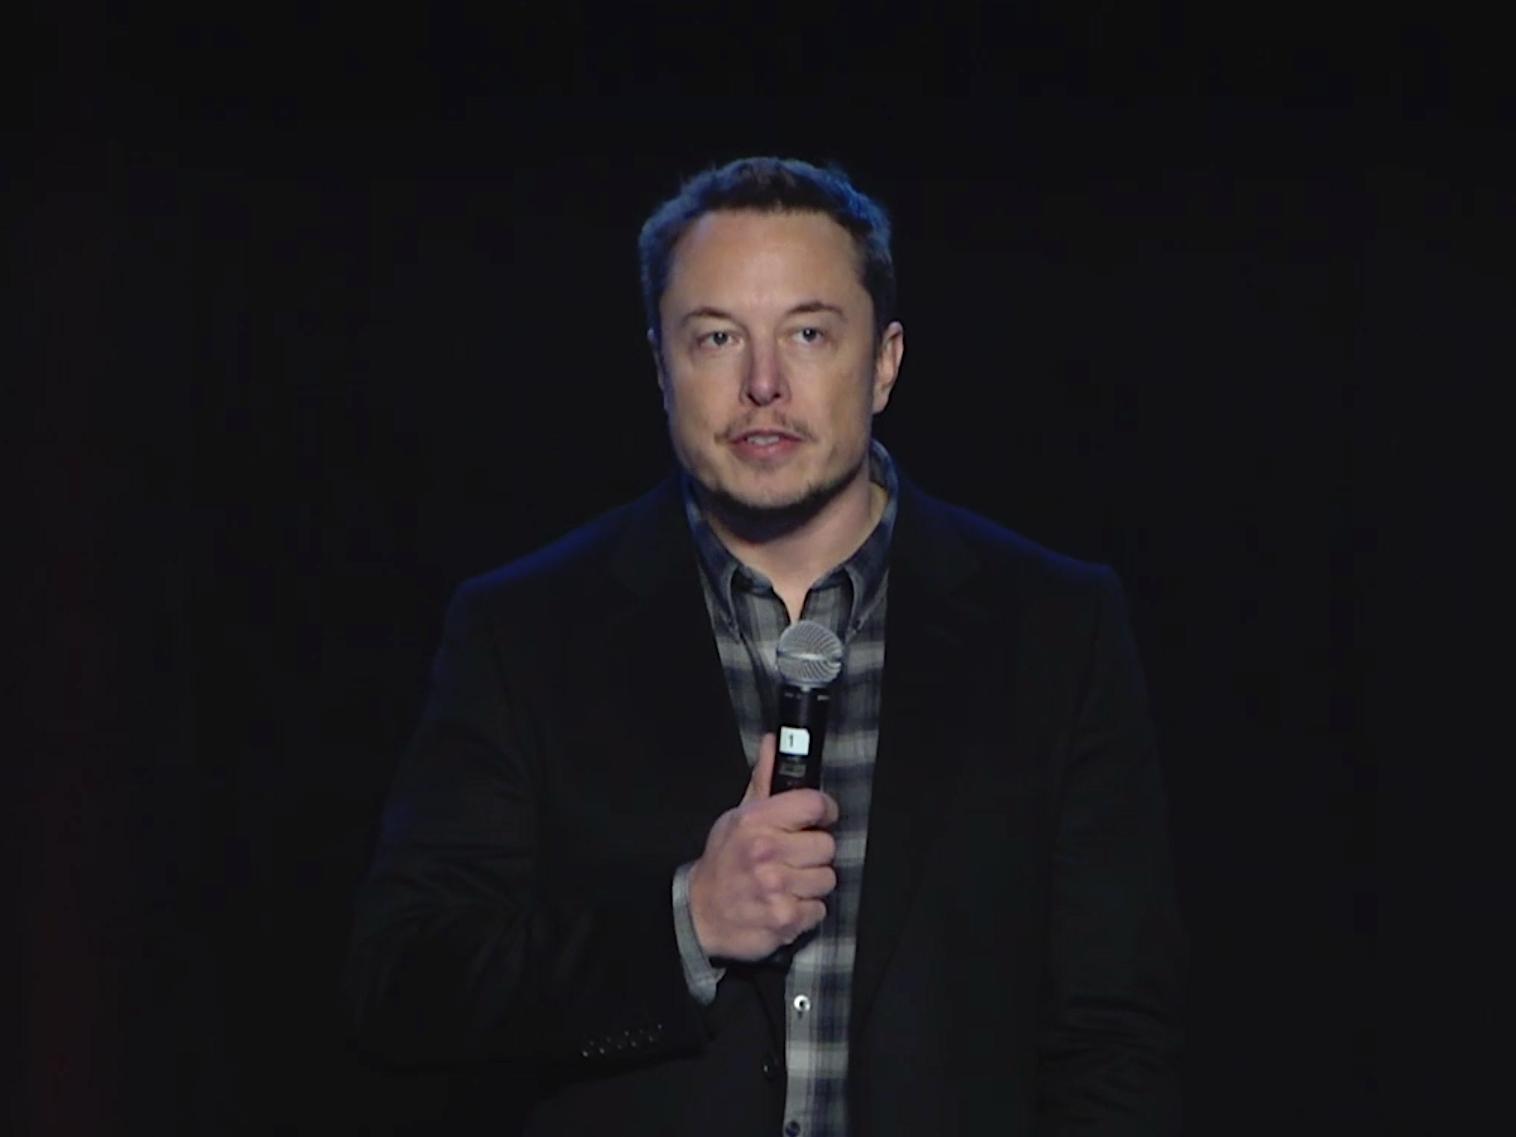 Elon during Thursday's post-vote Q&A session.